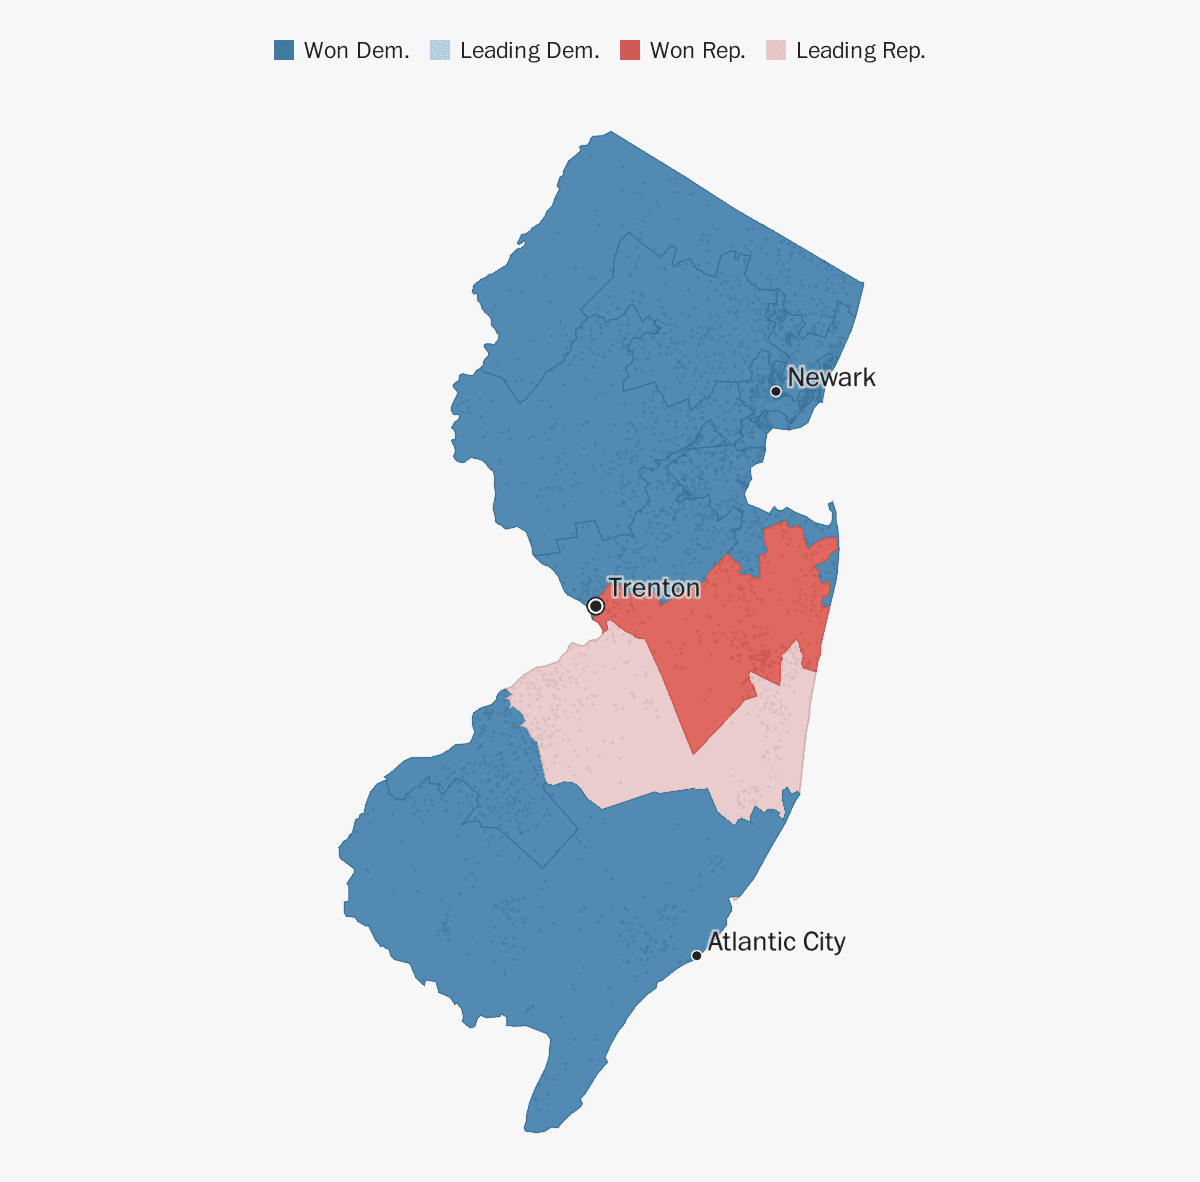 New Jersey election results 2018 - The Washington Post on google maps louisiana political, democrat vs republican states map, google poll,